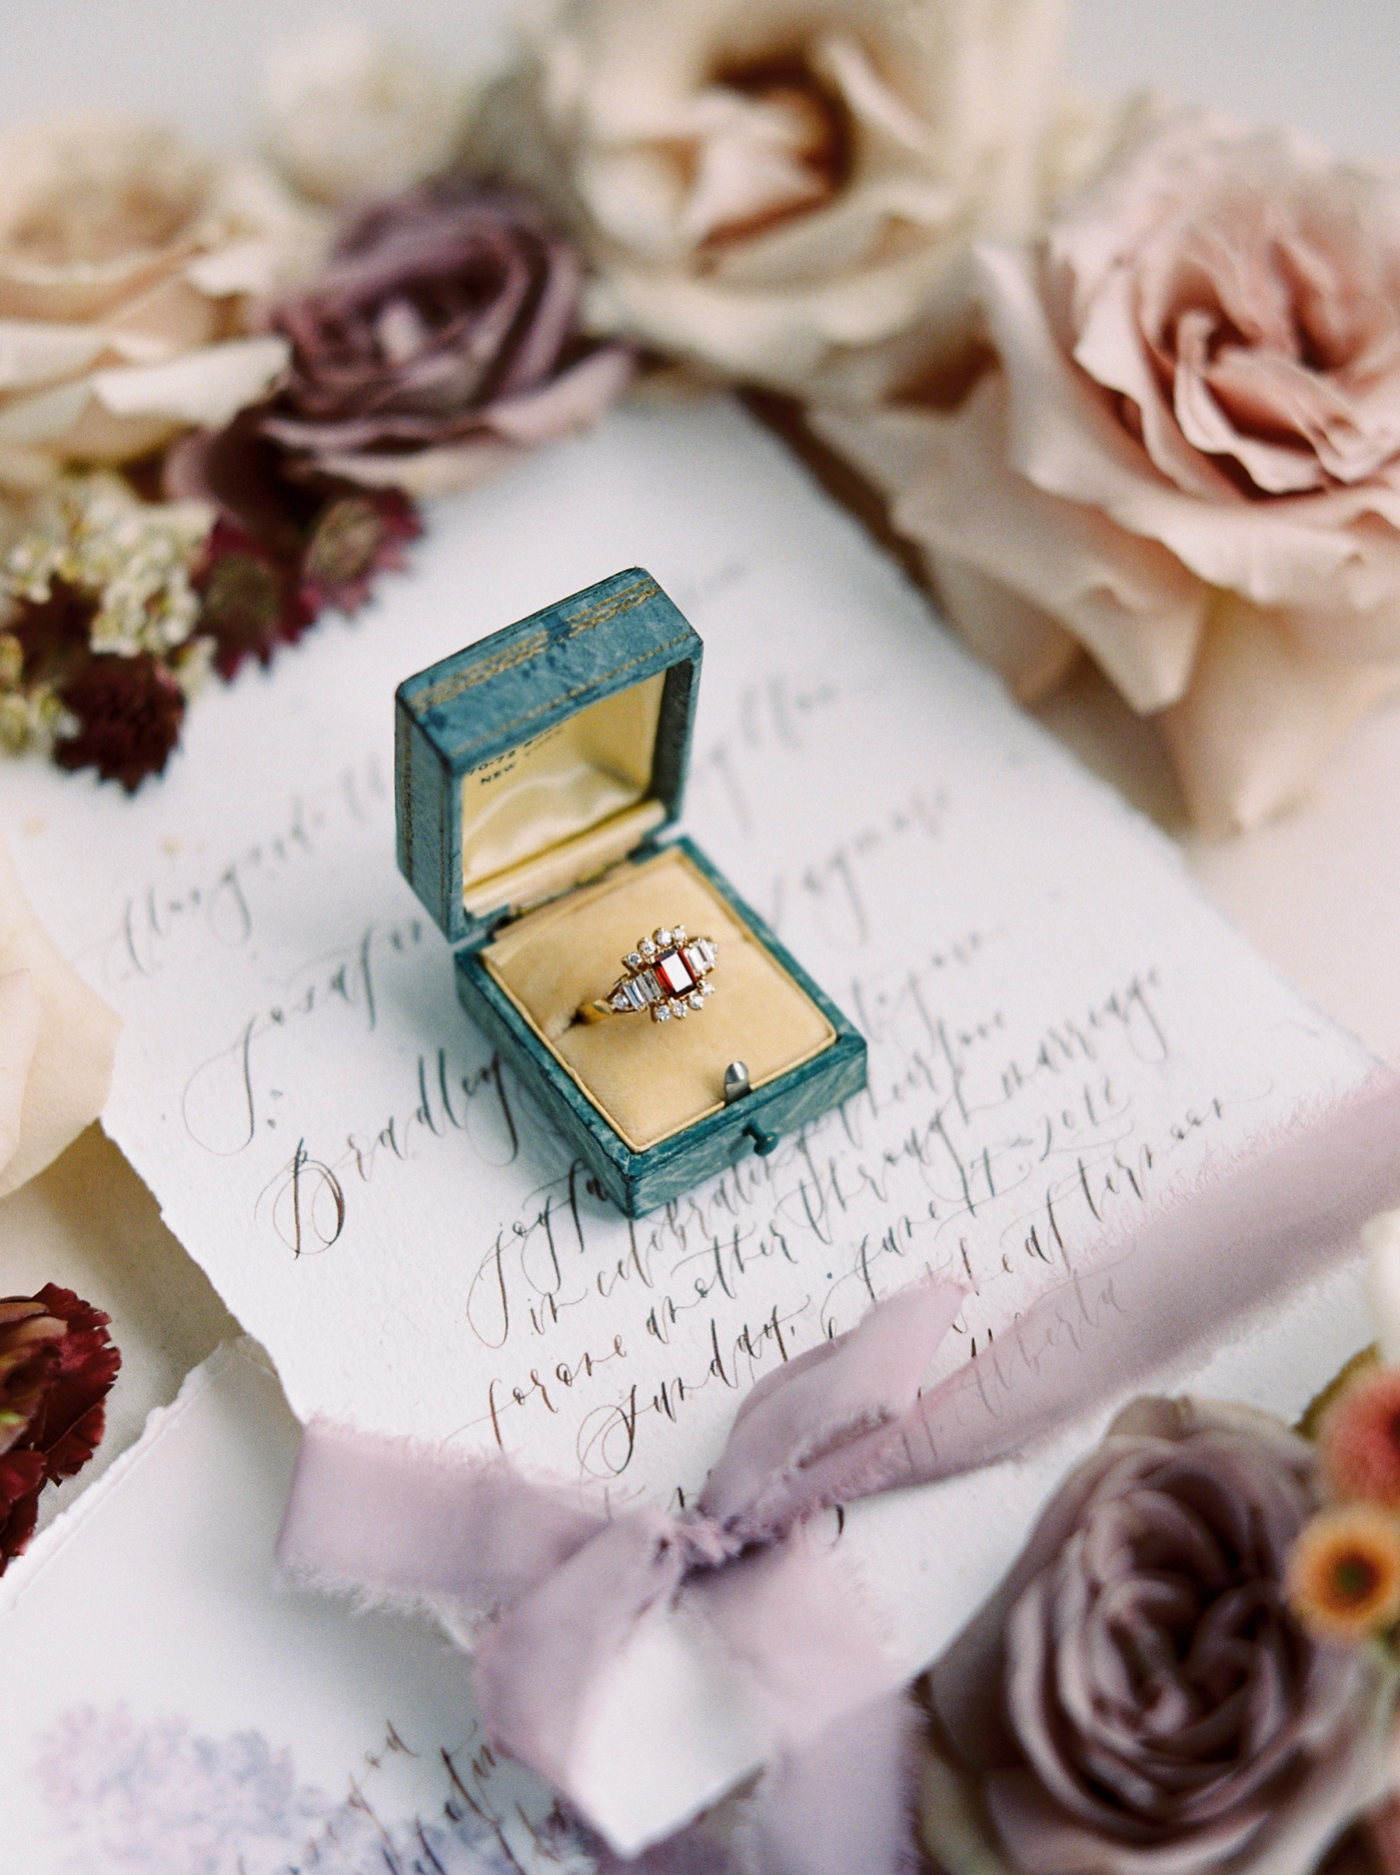 Stacey Foley Design Joy Wed Fine Art Series Photography Workshop | Banff wedding photographers | Rimrock resort wedding | wedding stationery vintage ring box engagement ring